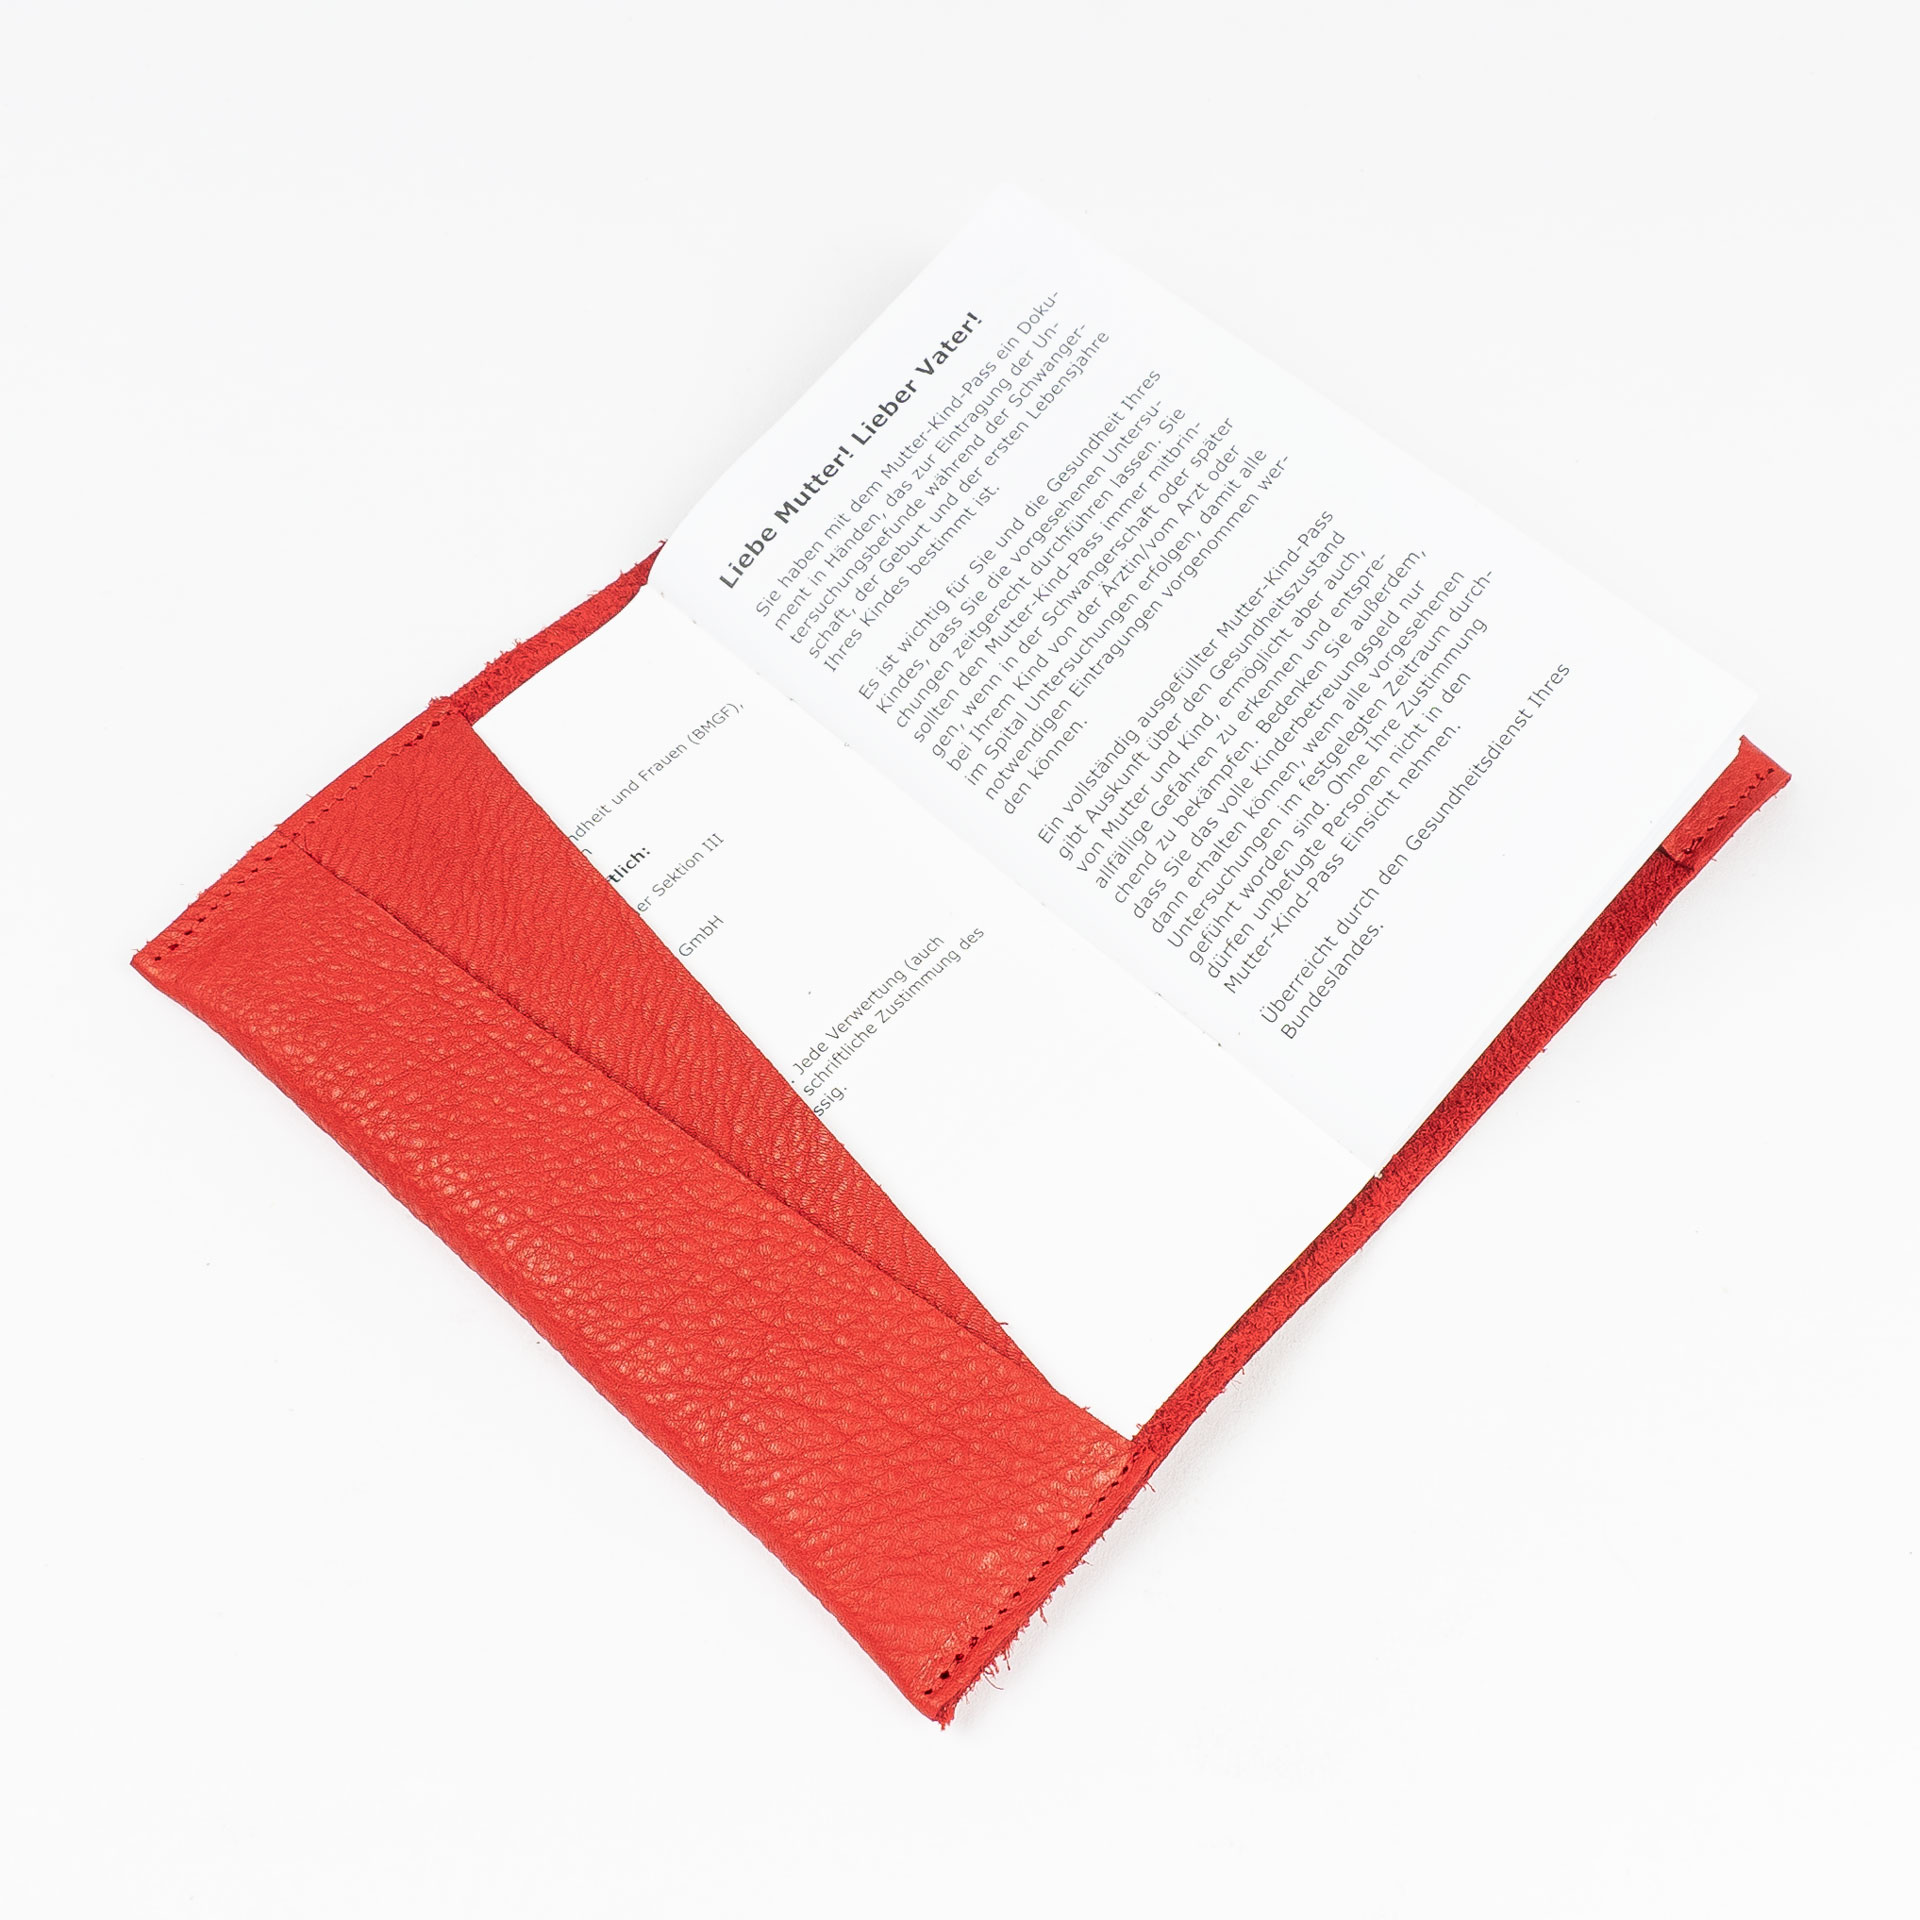 Mutter-Kind-Pass-Huelle-Oesterreich-Naturleder-Franziska-Klee-rot-einzelhuelle-befuellt